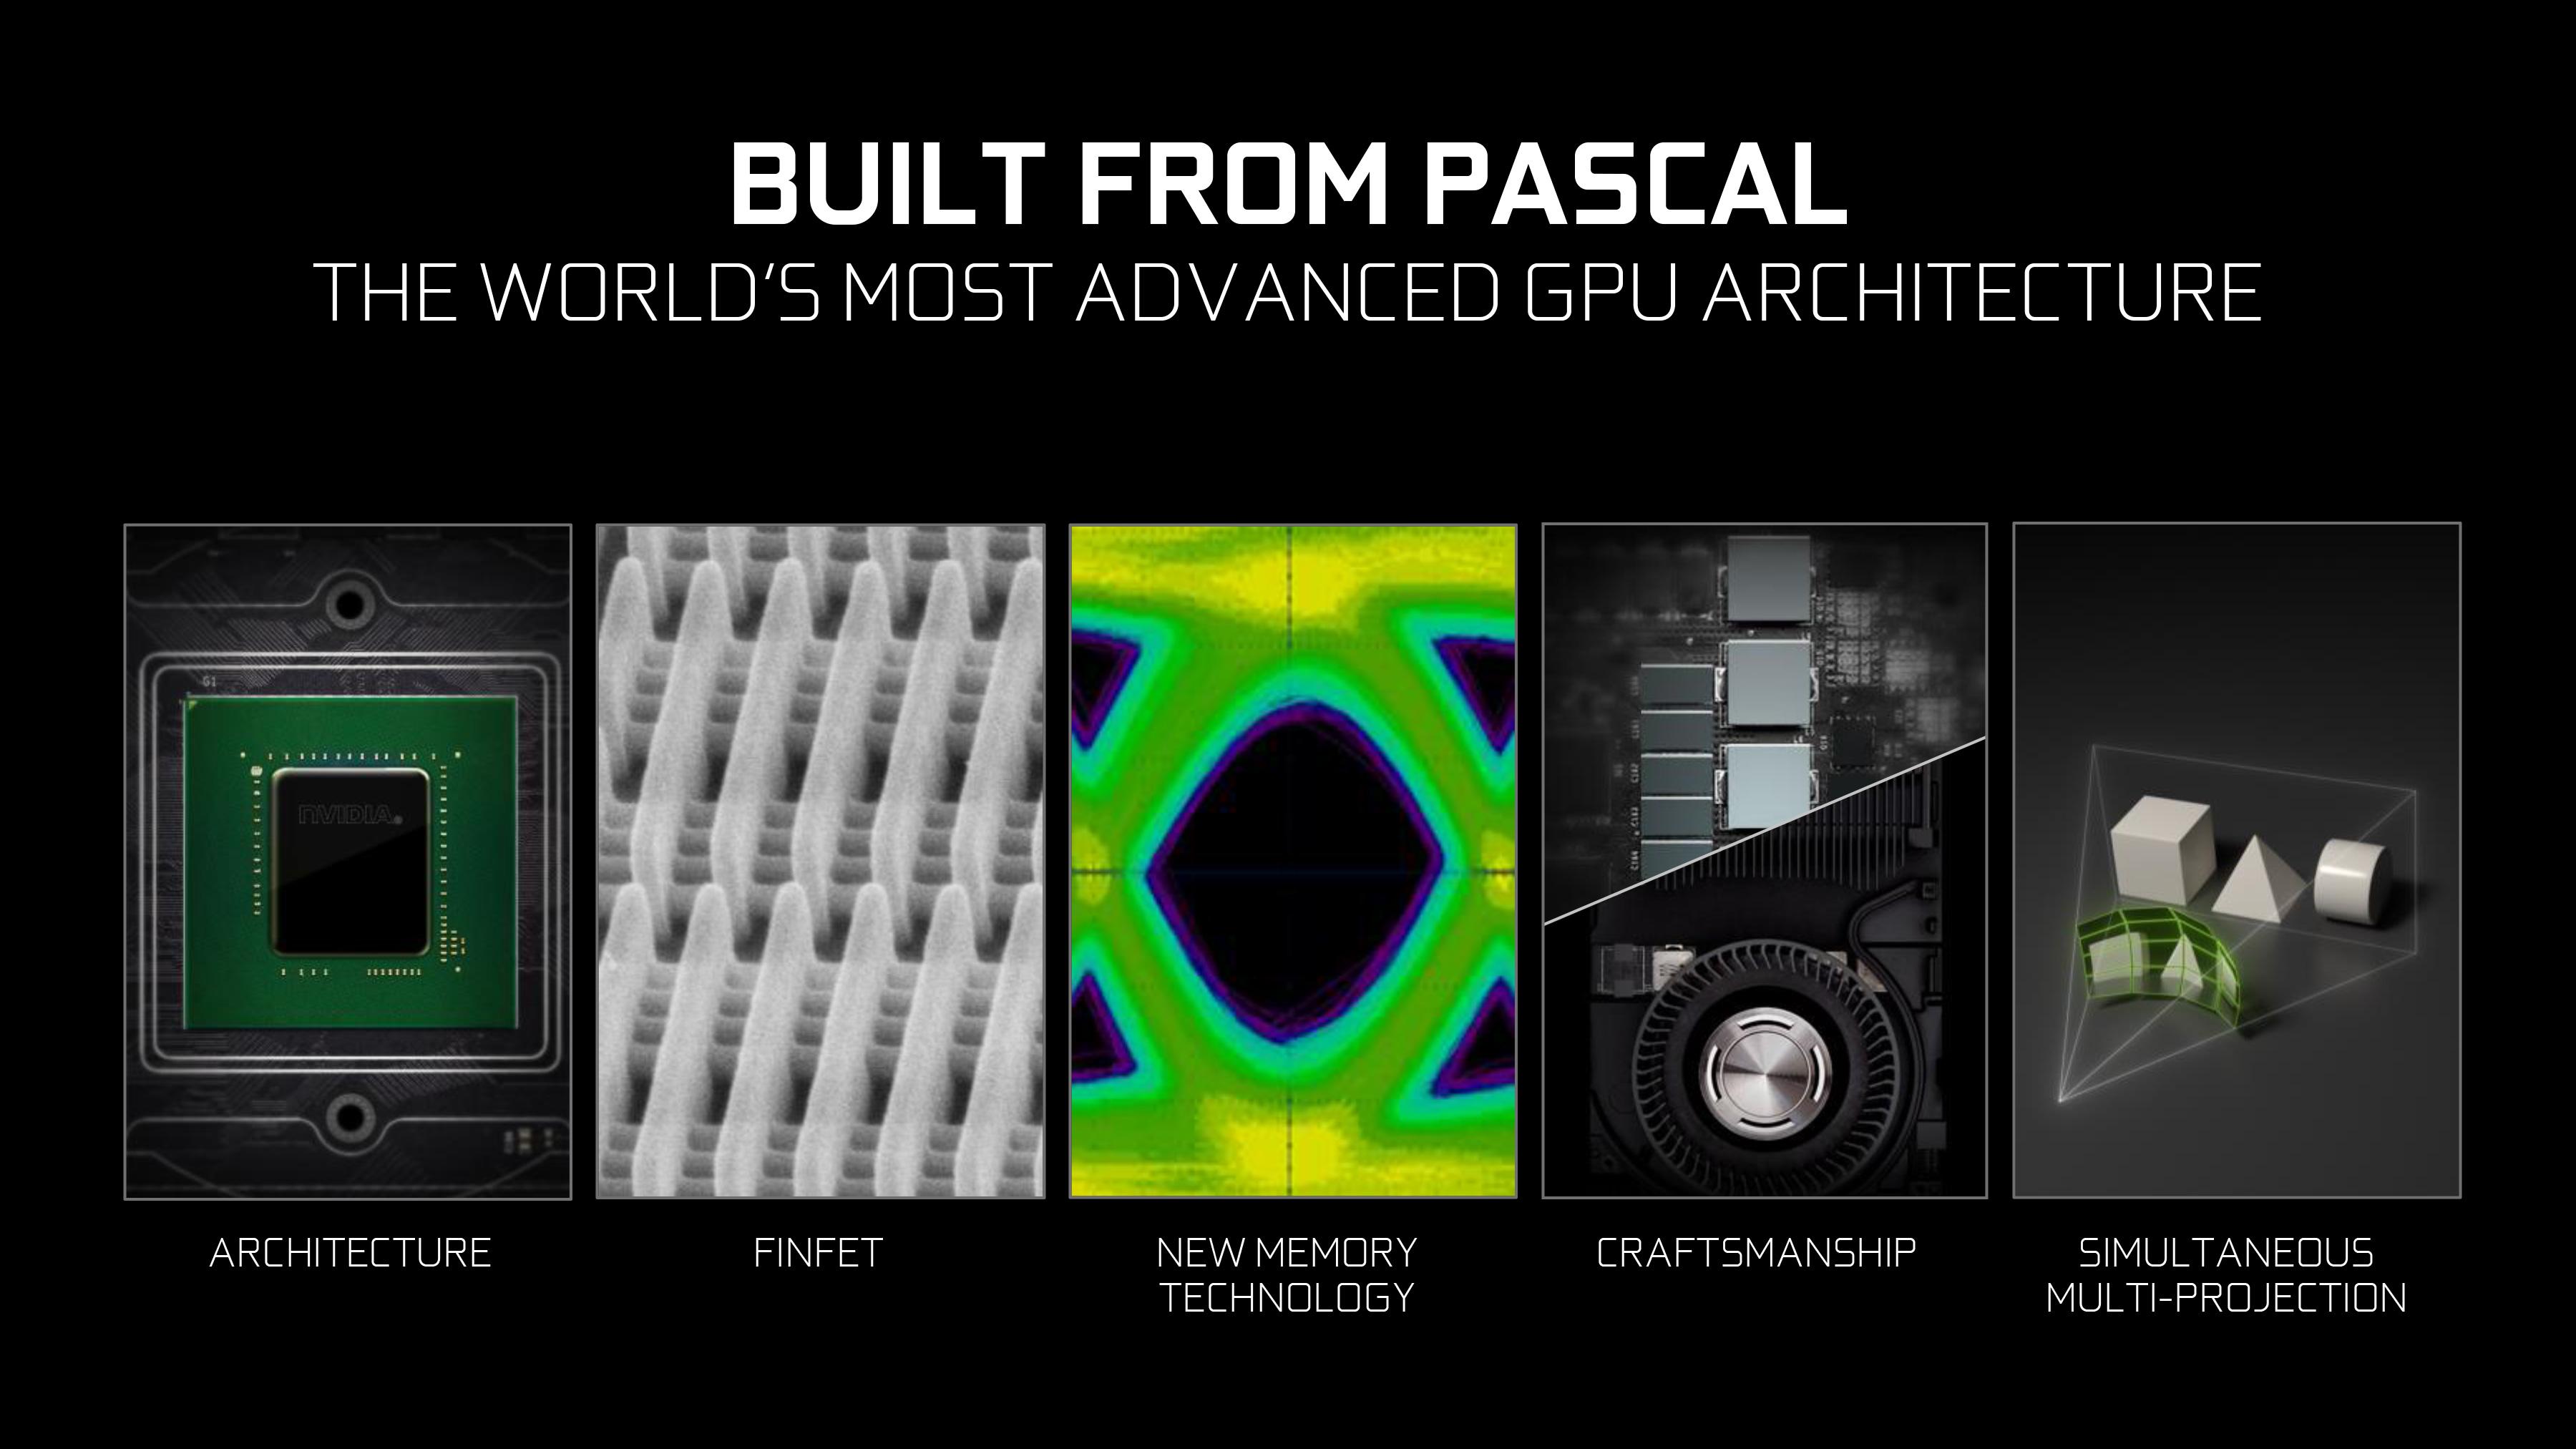 Nvidia Announces Geforce Gtx 1050 Ti Entry Level Cards Inno 3d 1050ti 4gb Ddr5 Compact Gp107 An Enigma Of A Gpu